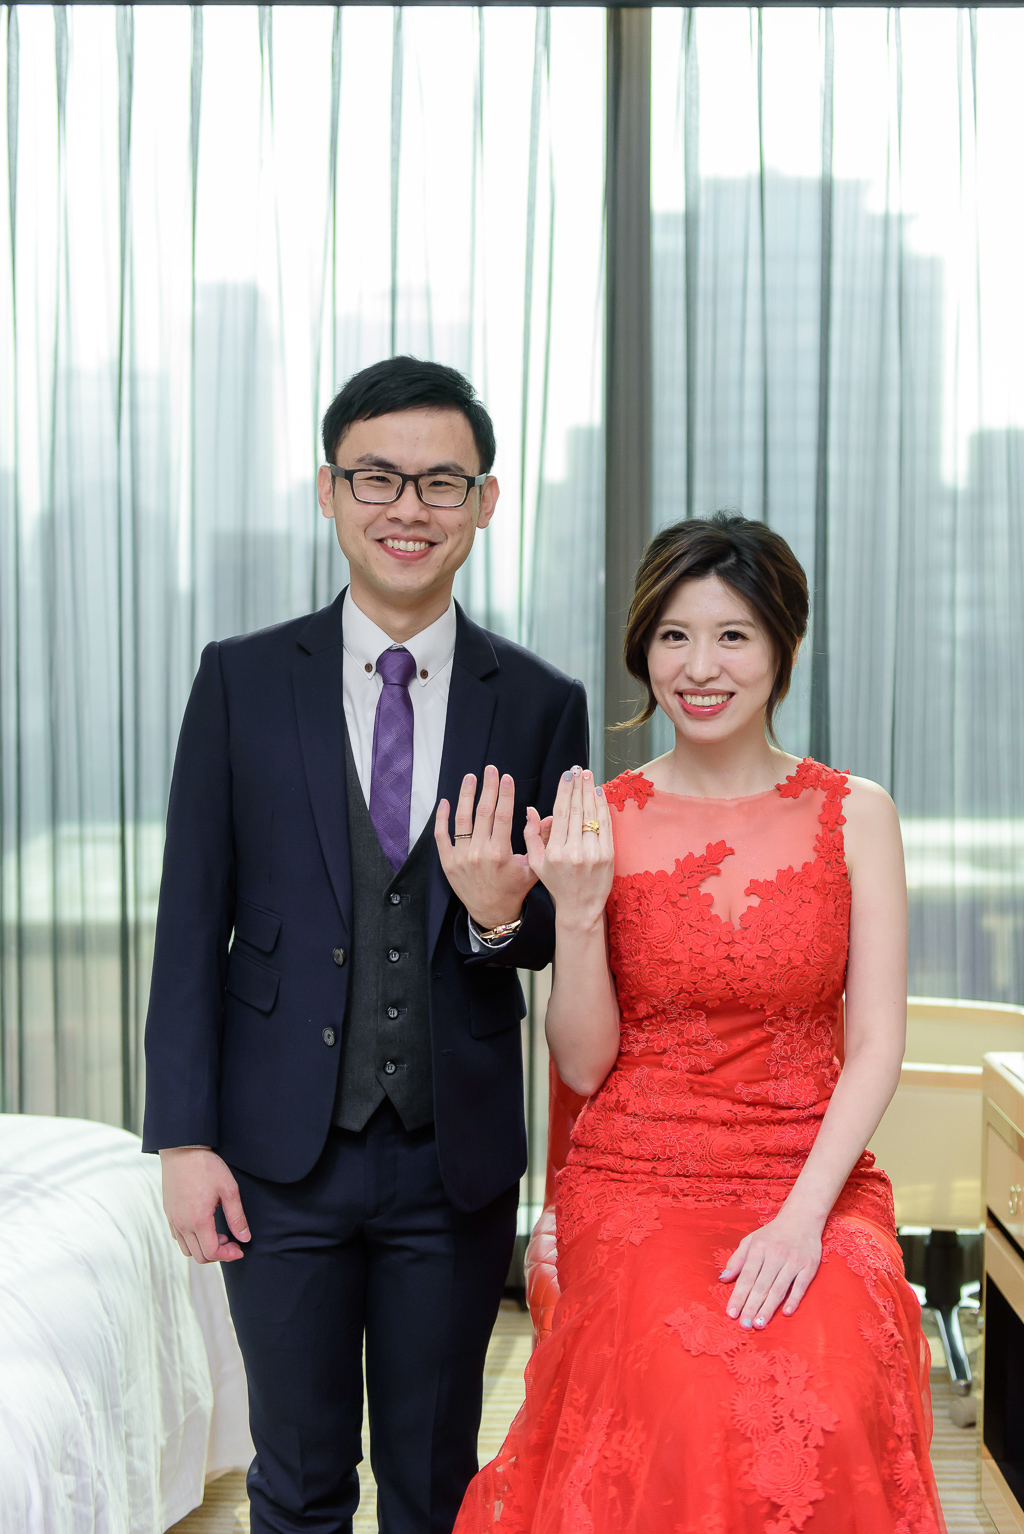 Wedding day-0017 ,僑園婚攝,台中僑園,僑園婚宴,新秘Alice ,婚攝小勇,台北婚攝, 小淑造型團隊